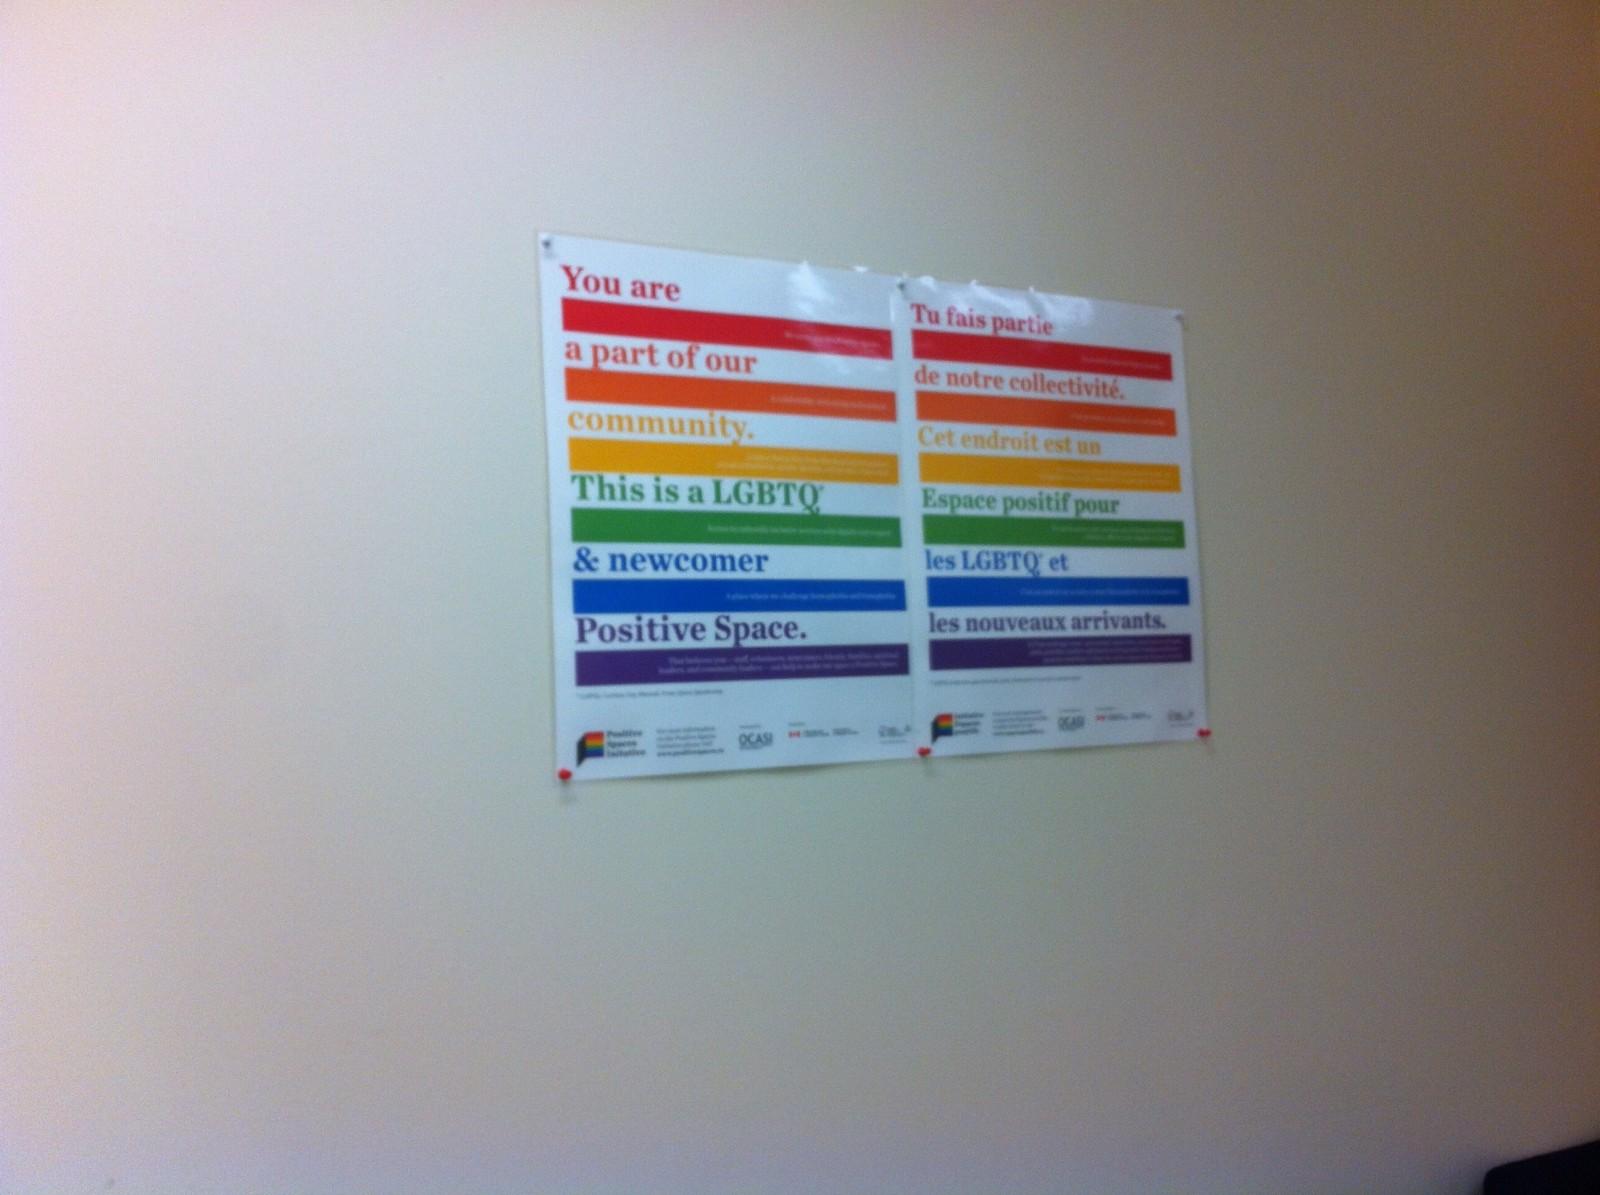 London InterCommunity Health Centre helps those entering their Gender Journey